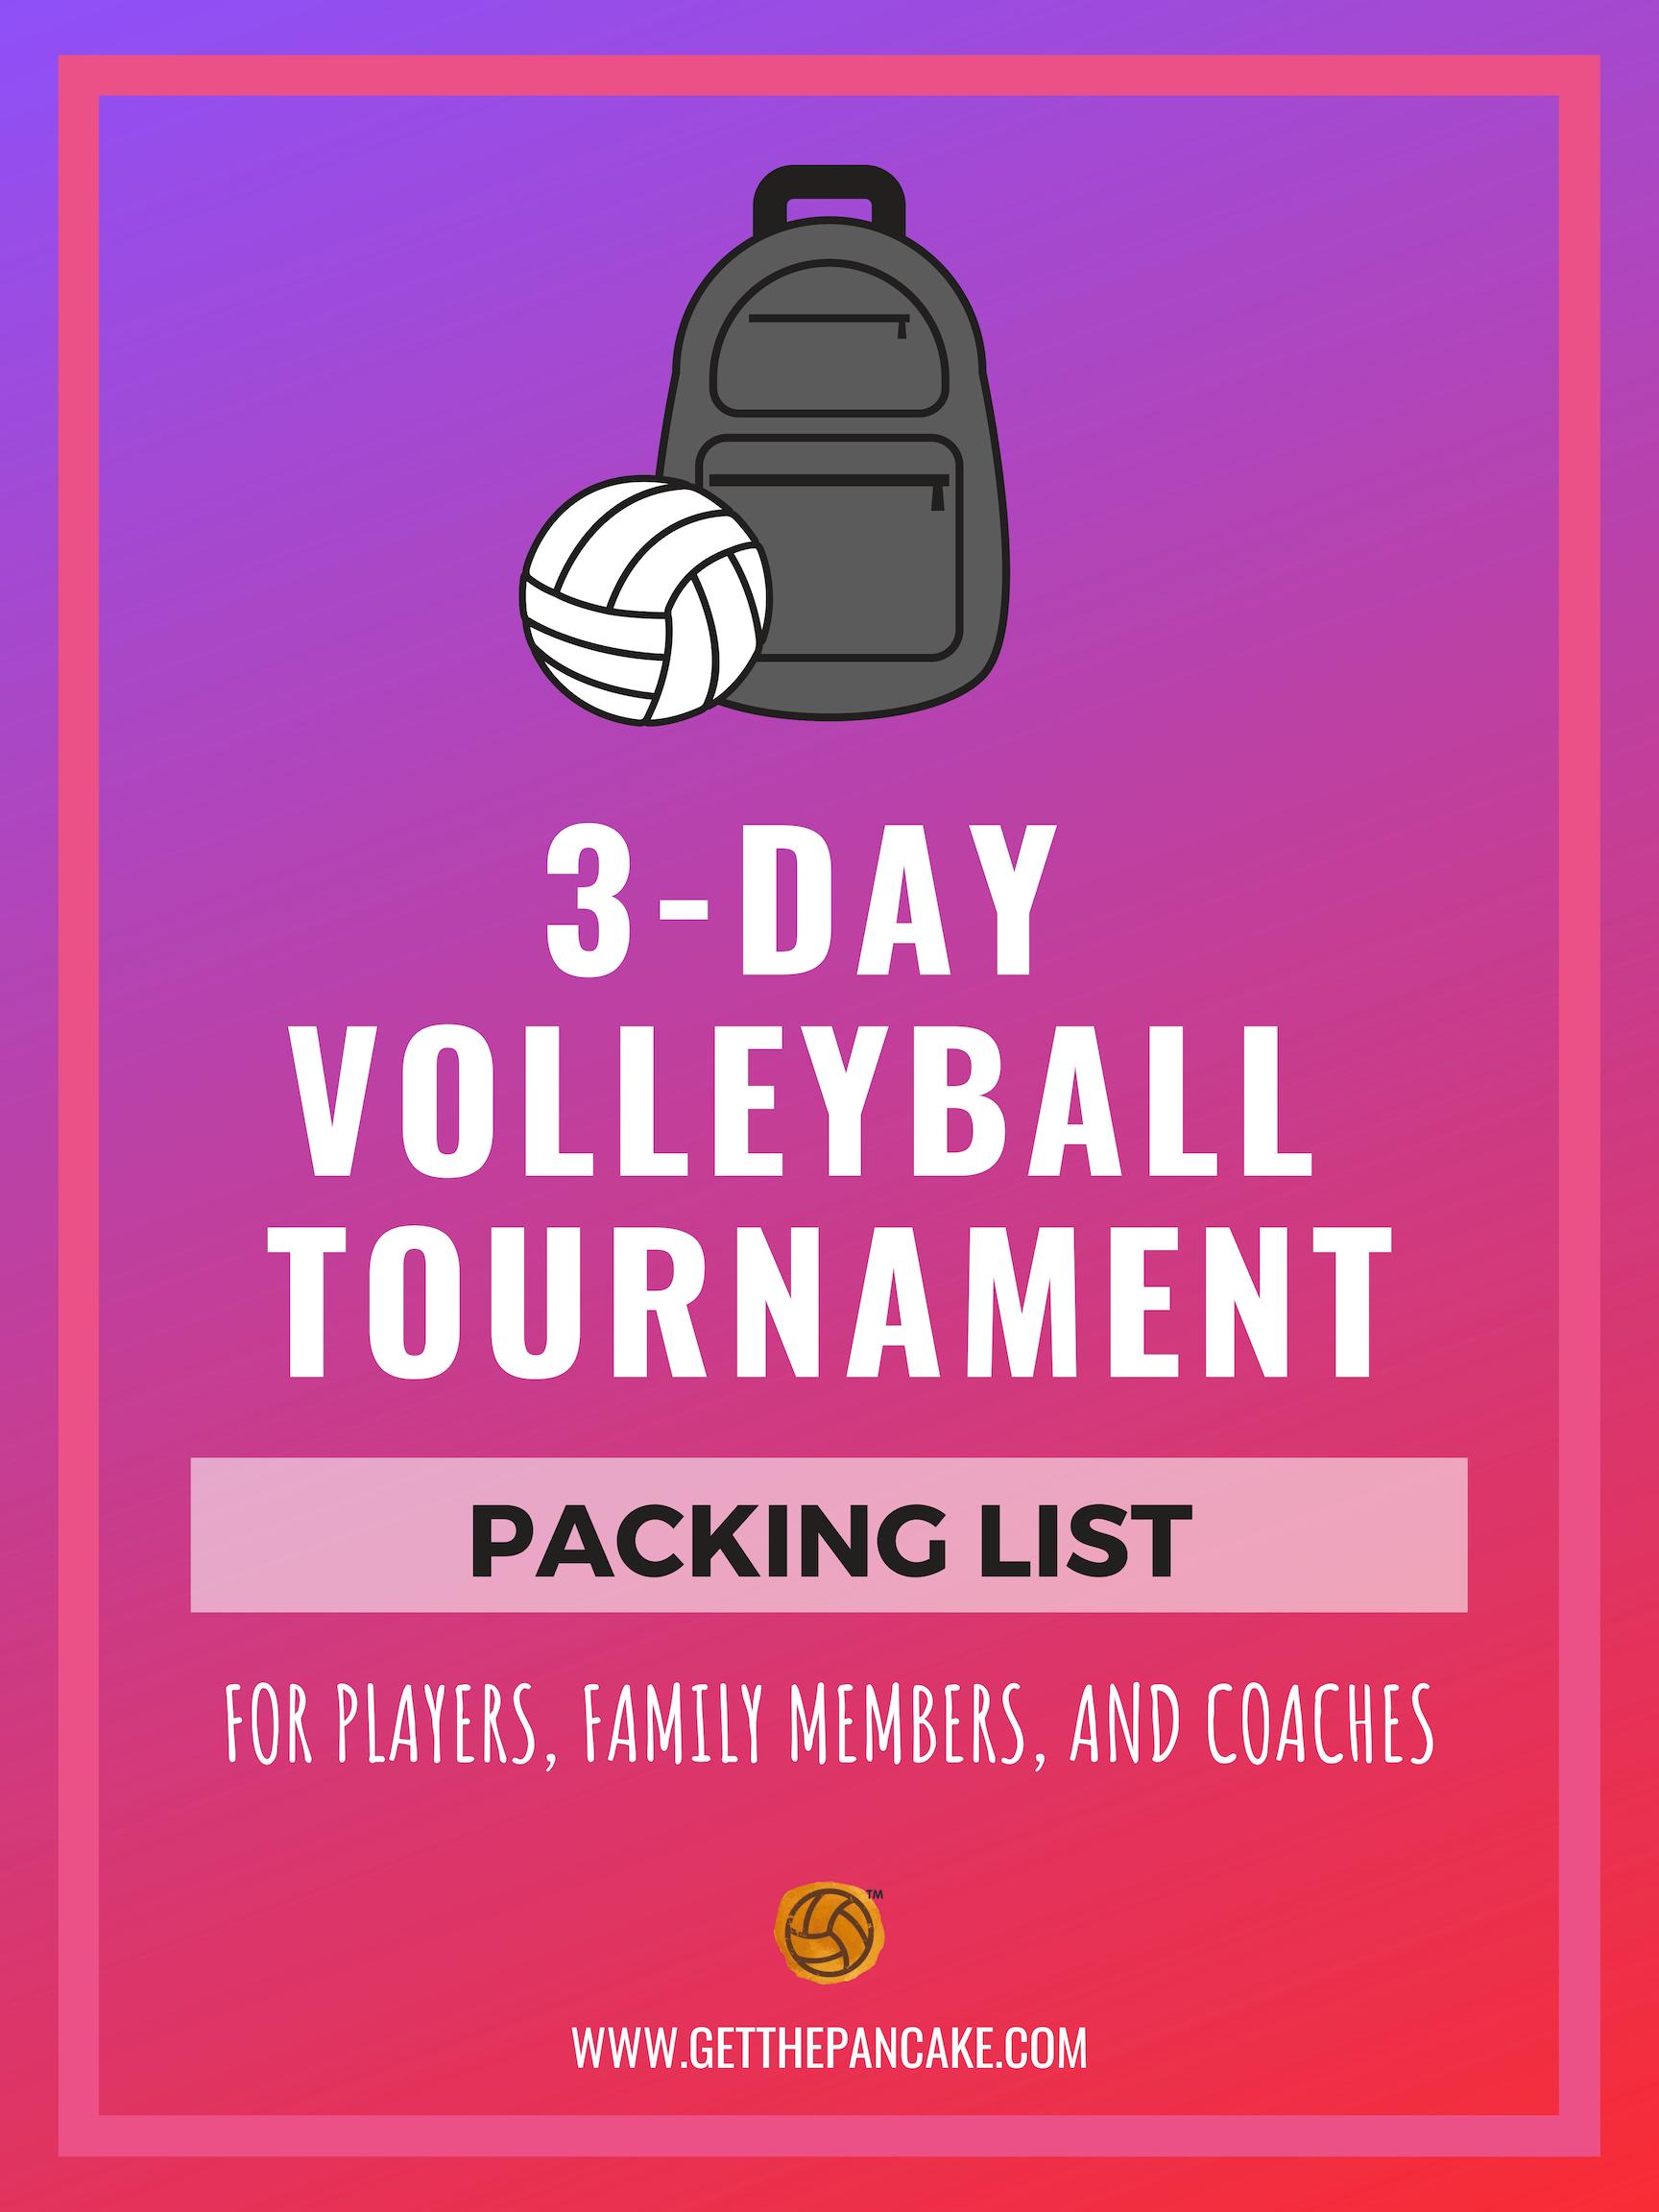 Packing List Volleyball Tournament Get The Pancake.jpg